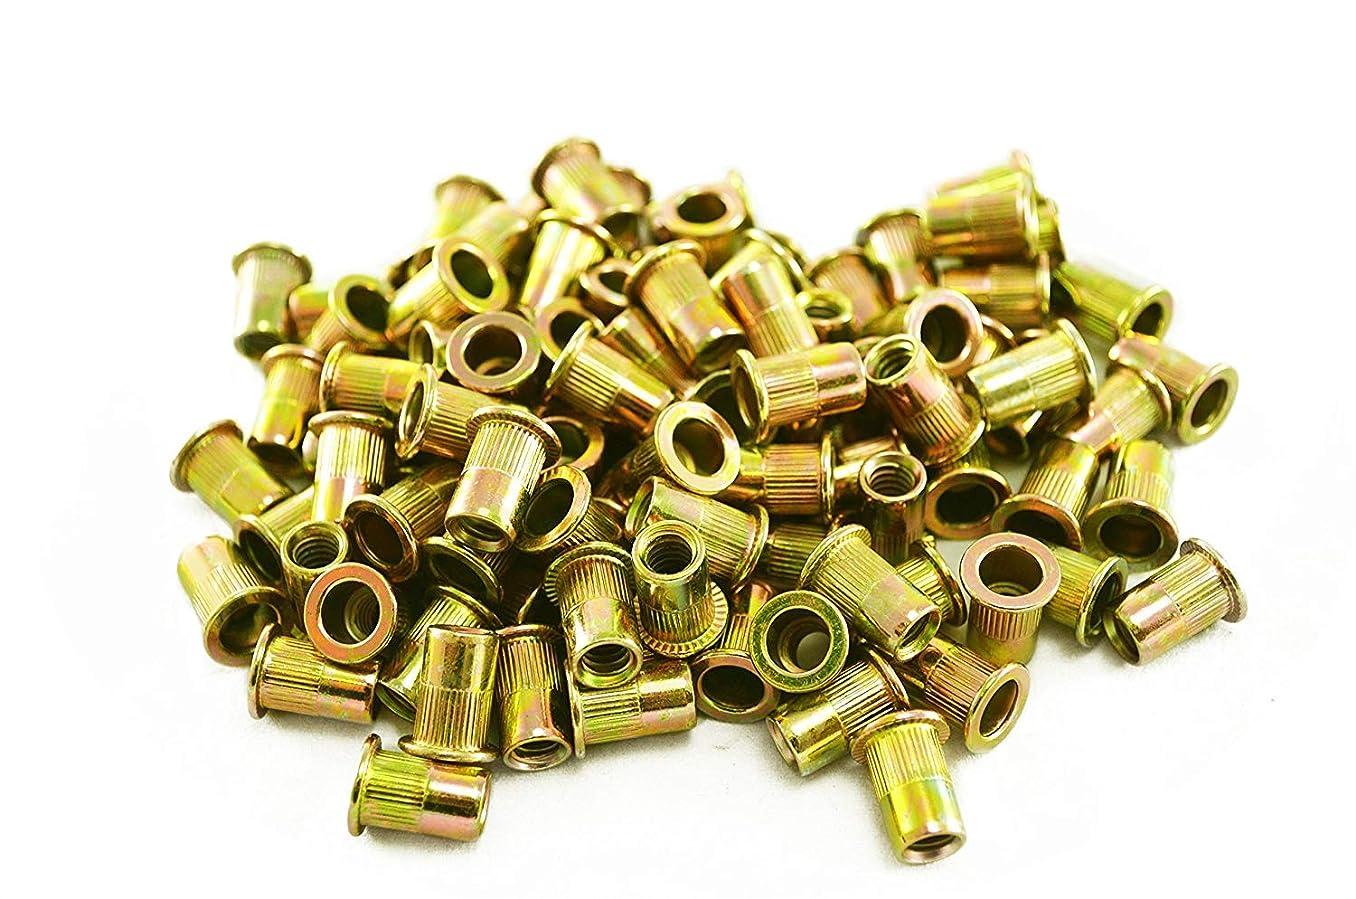 Liyafy 100Pcs Pneumatic Tool Pull Nut Steel Rivet Nuts M4 X 11 (Carbon Steel/Color zinc)